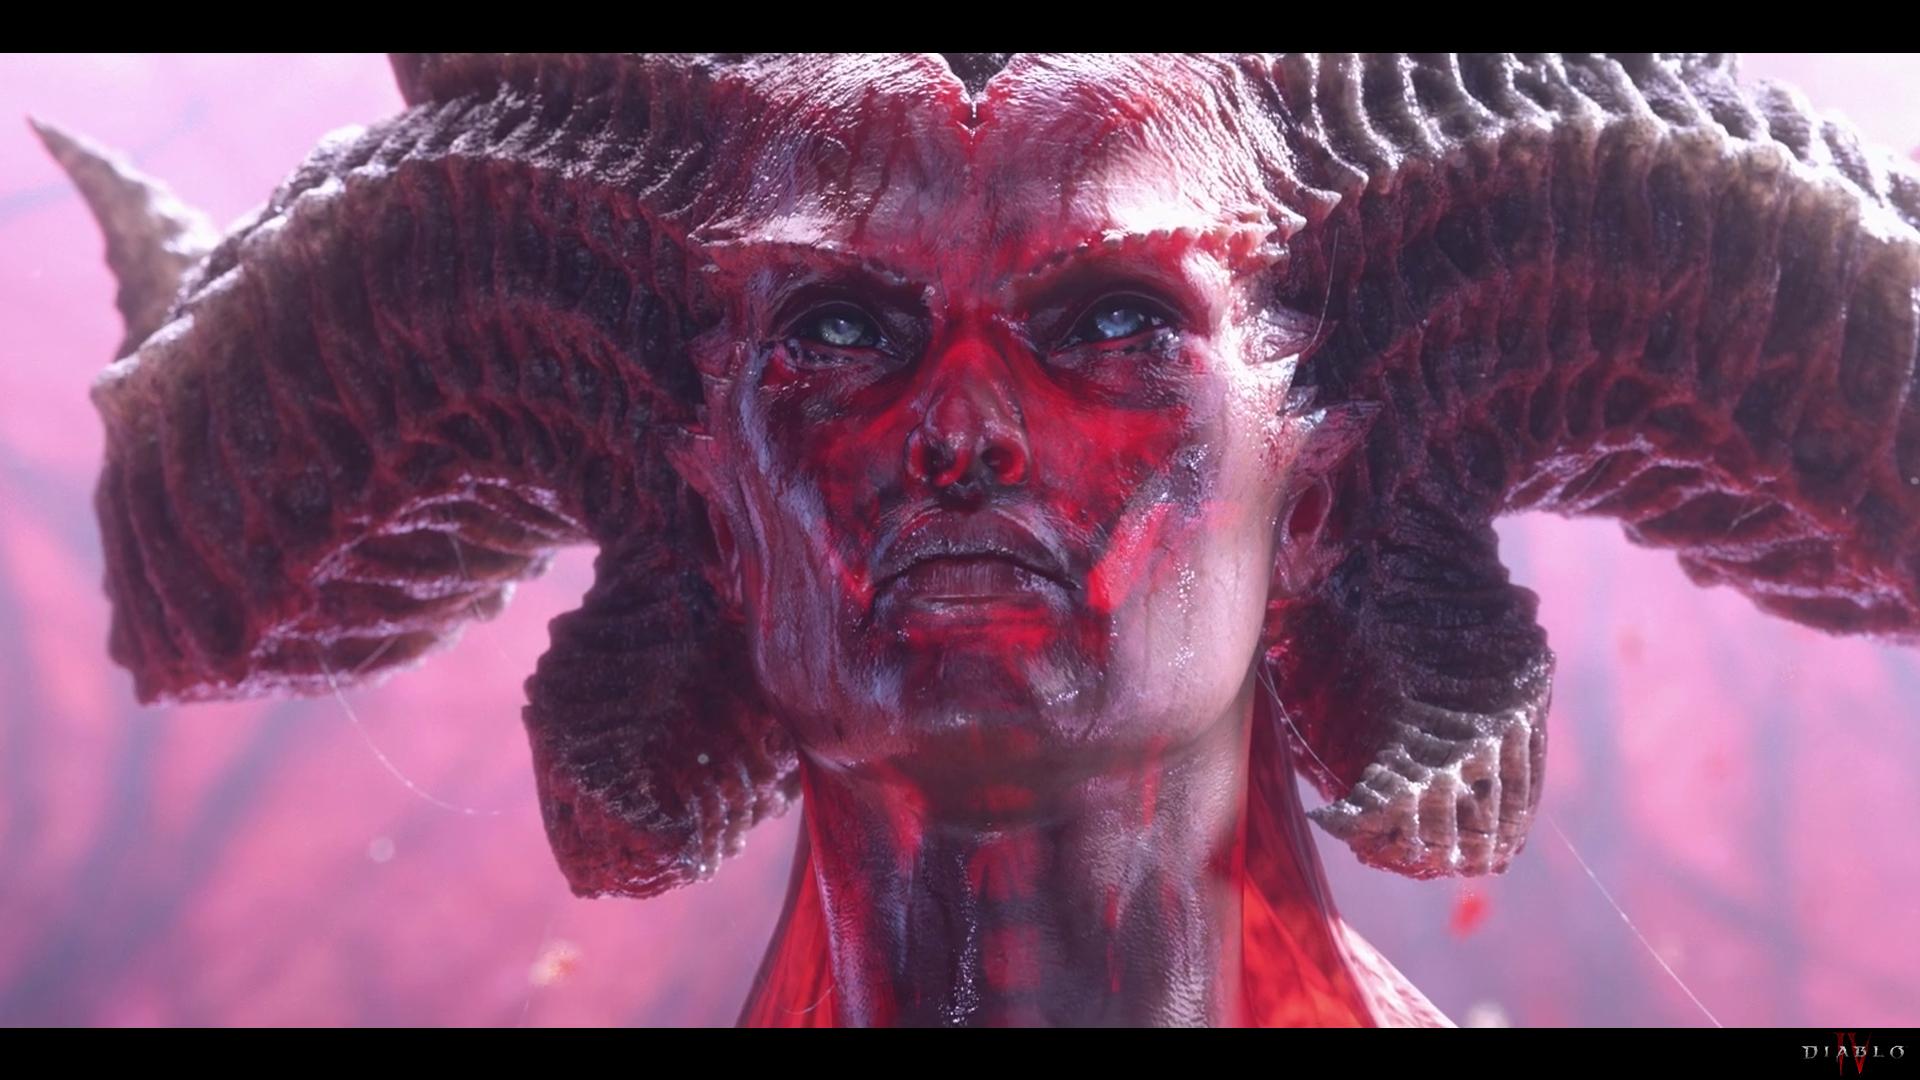 General 1920x1080 Diablo diablo 4 diablo iv Blizzard Entertainment Lilith (Diablo)